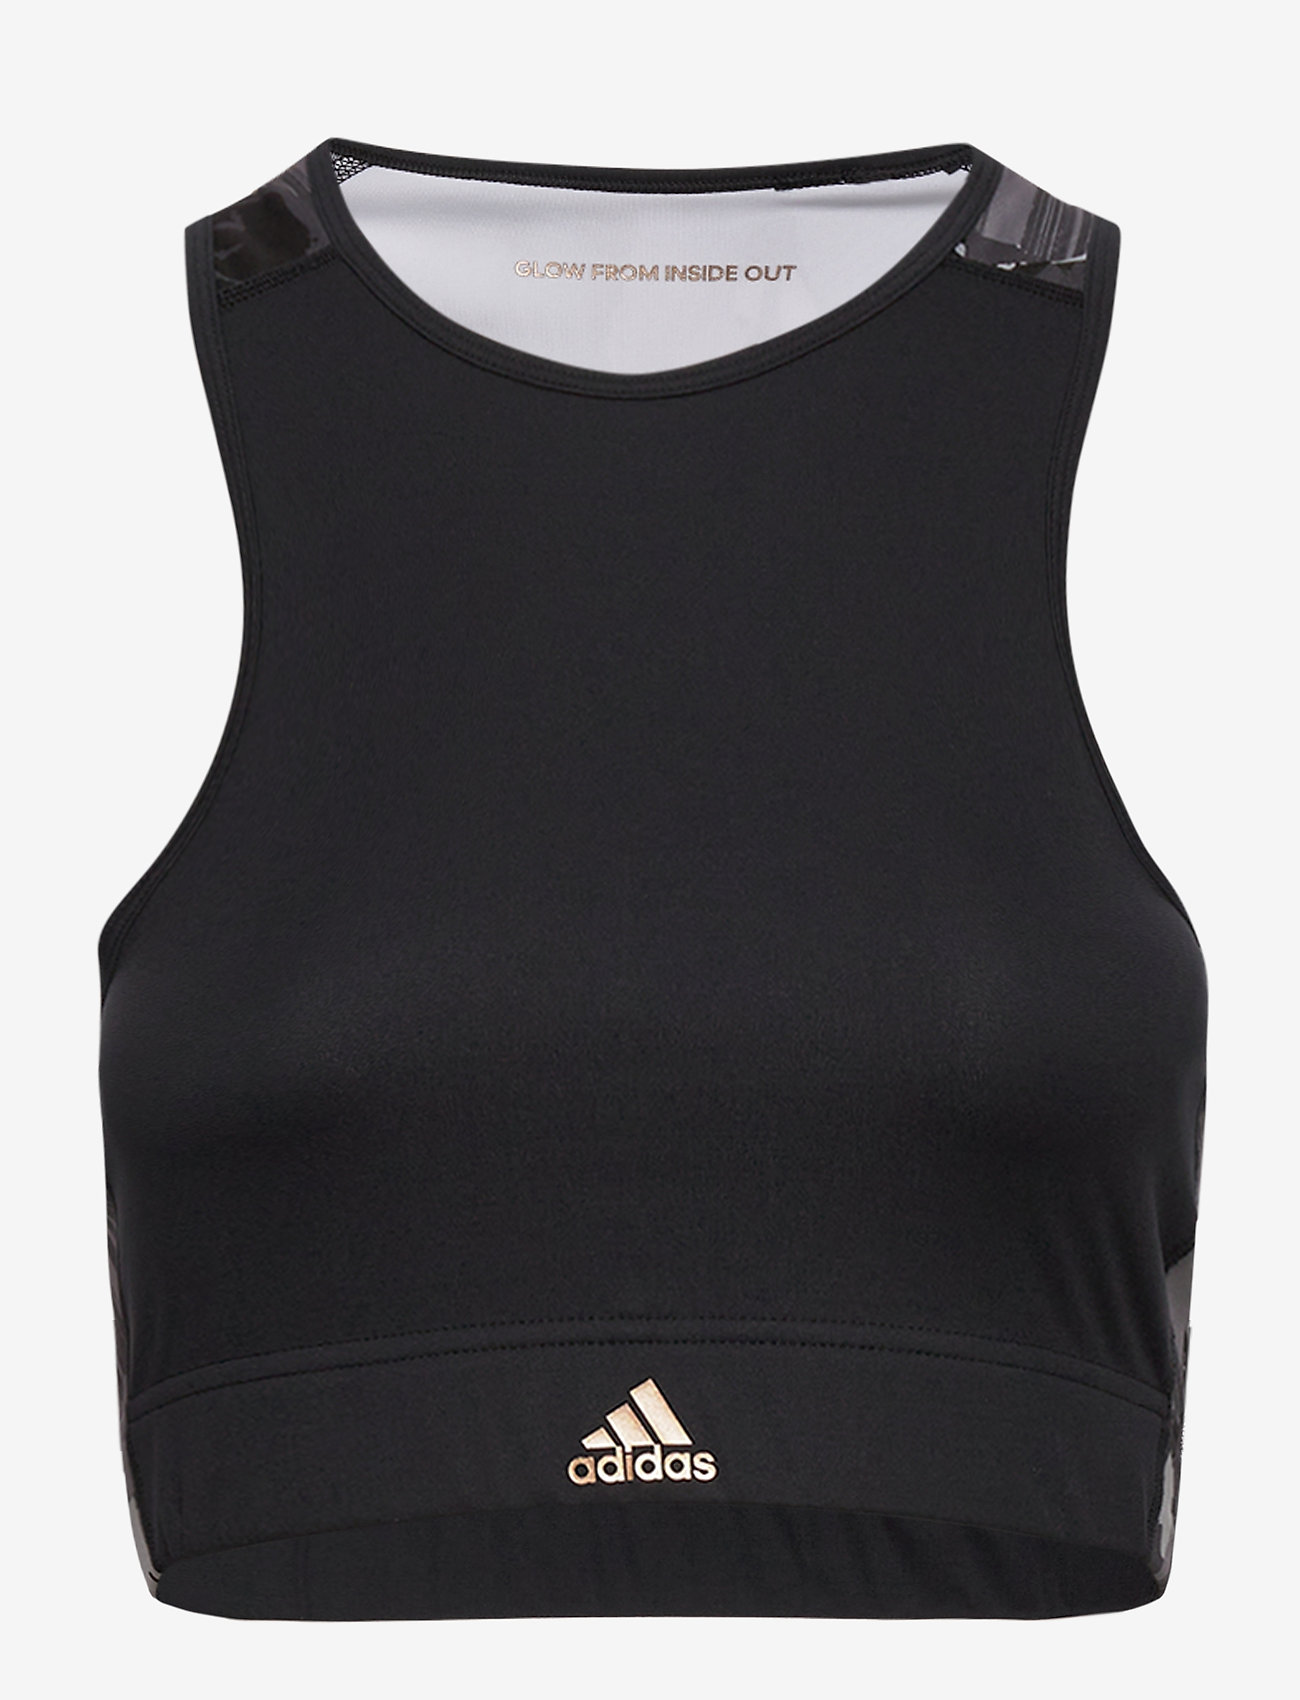 adidas Performance - W U-B-U B TOP - sportbeh''s: low - black/coppmt - 0